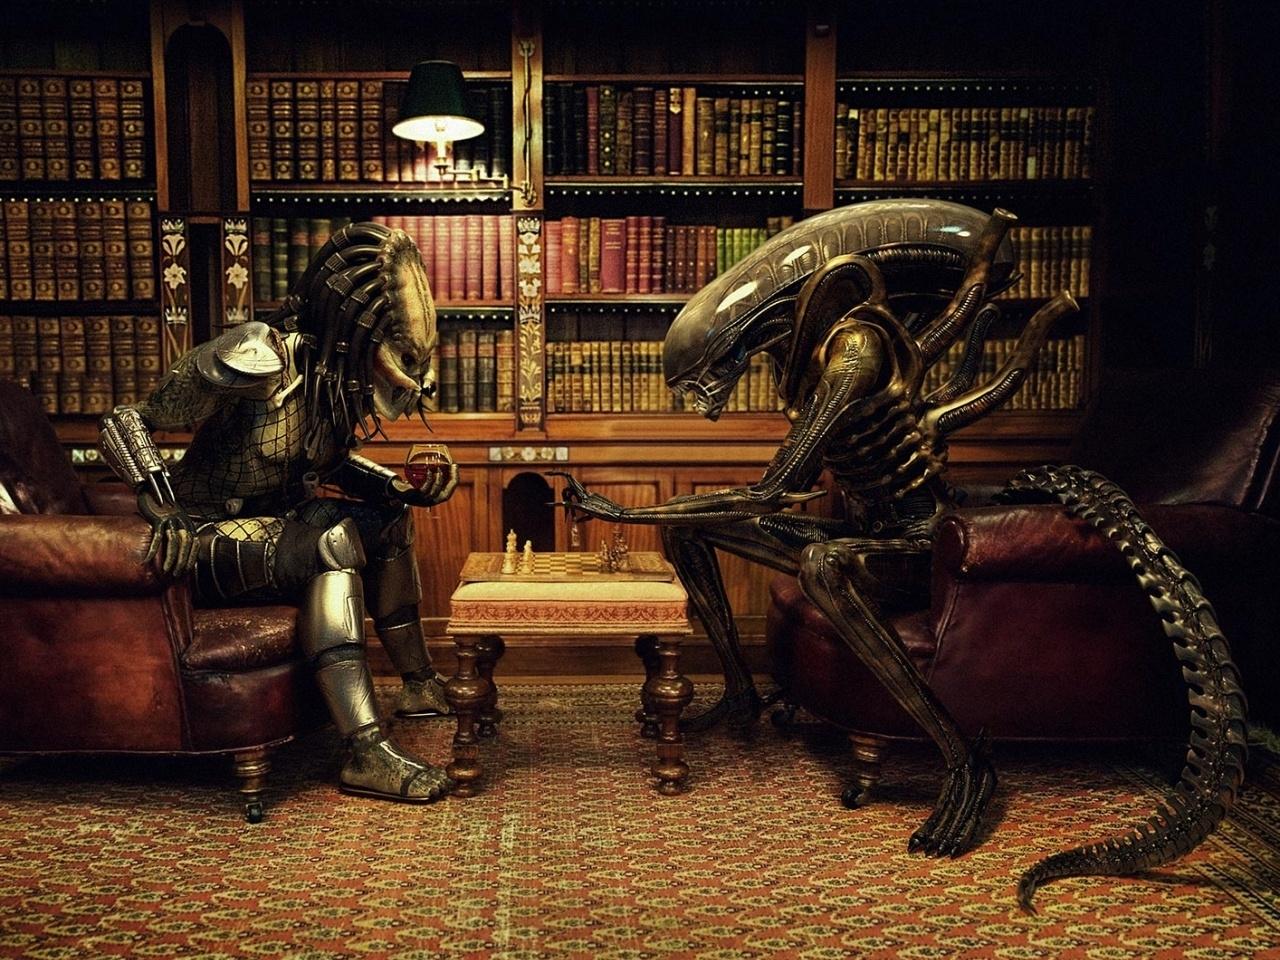 38638 download wallpaper Cinema, Avp: Alien Vs. Predator screensavers and pictures for free